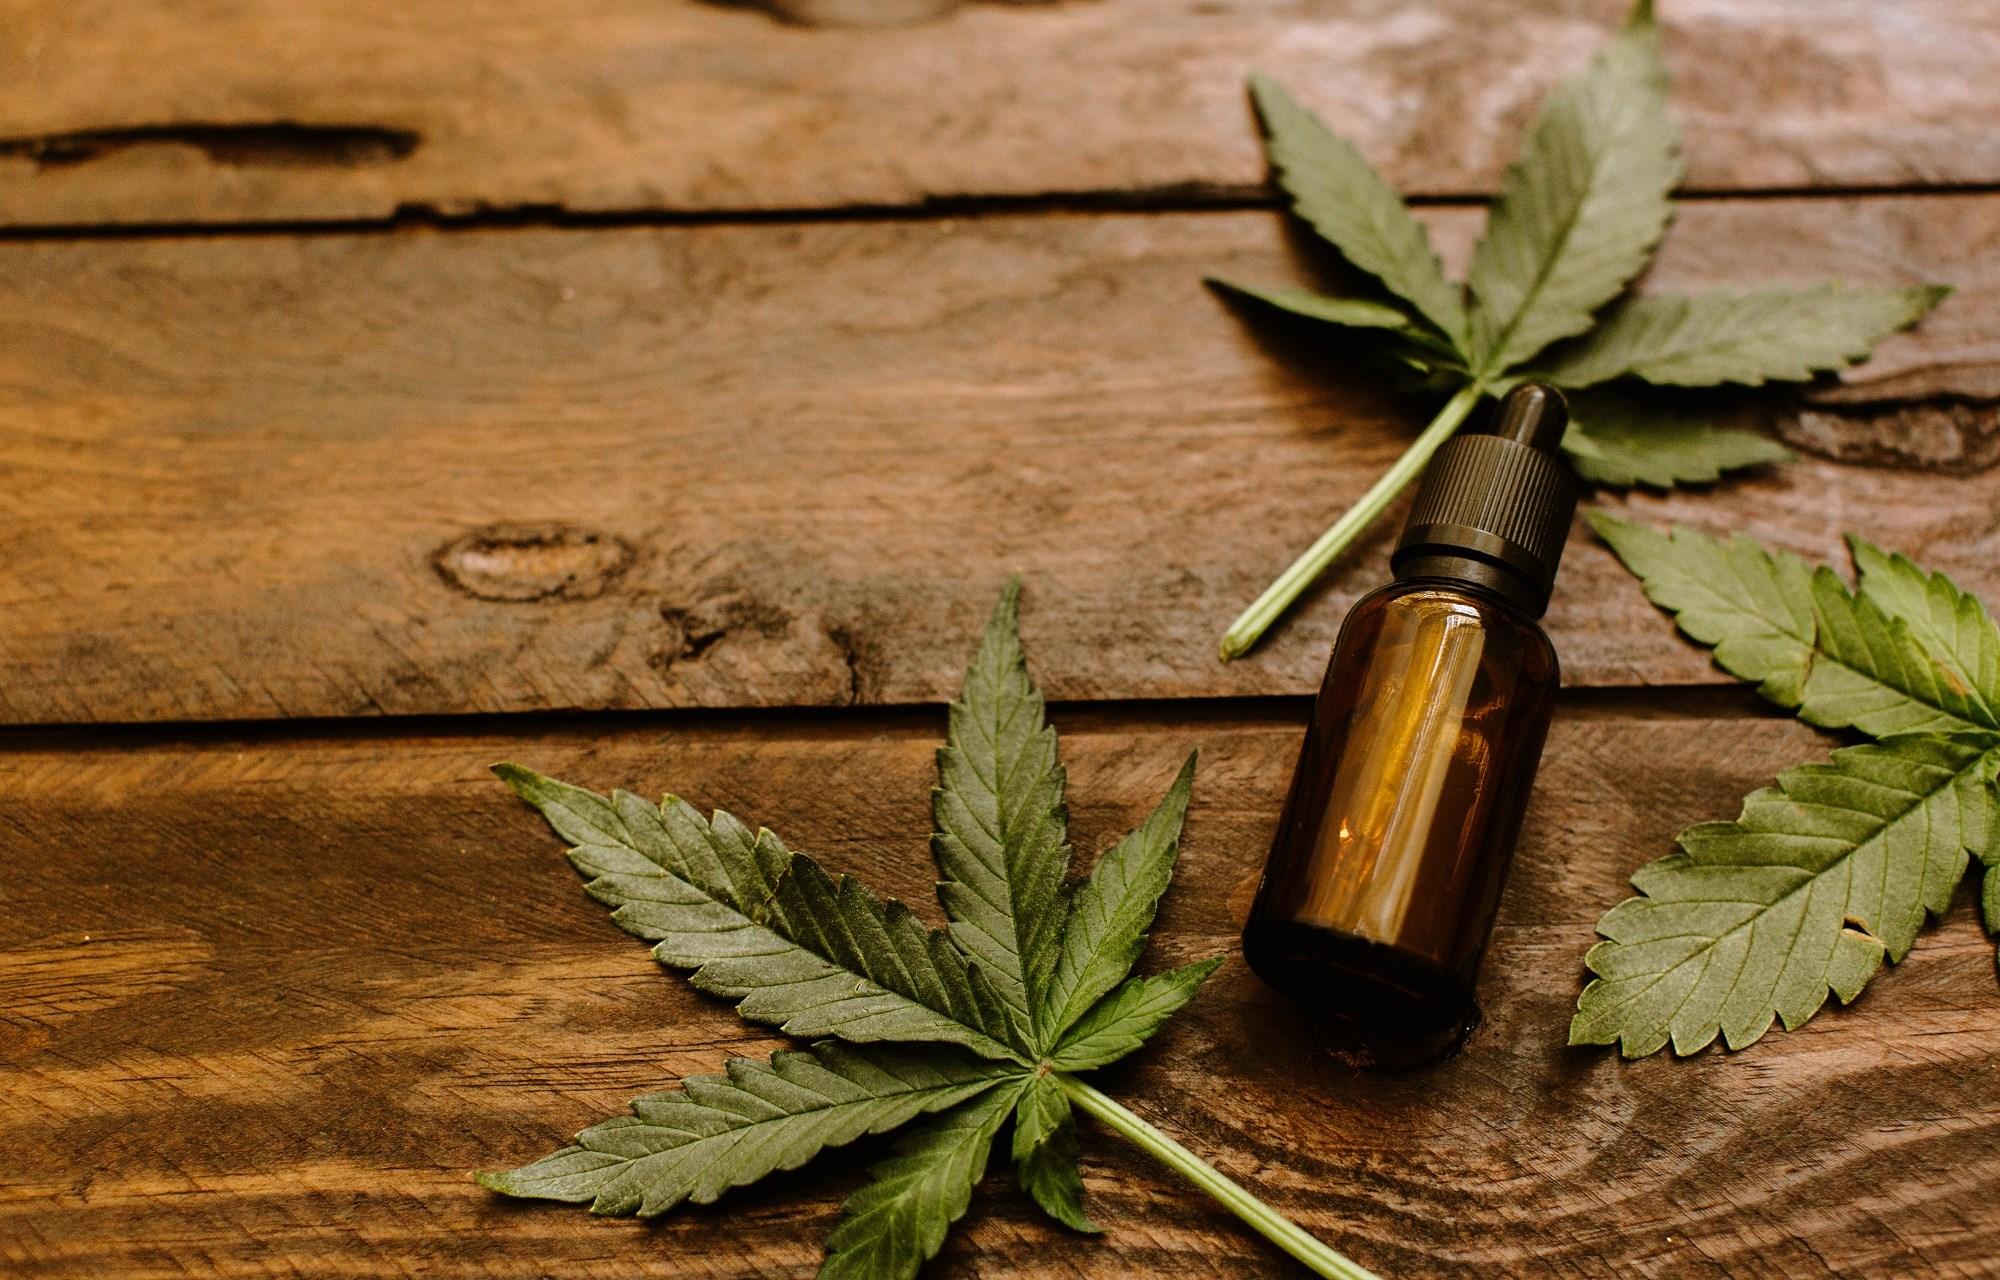 Many US Adults View Marijuana Use Positively